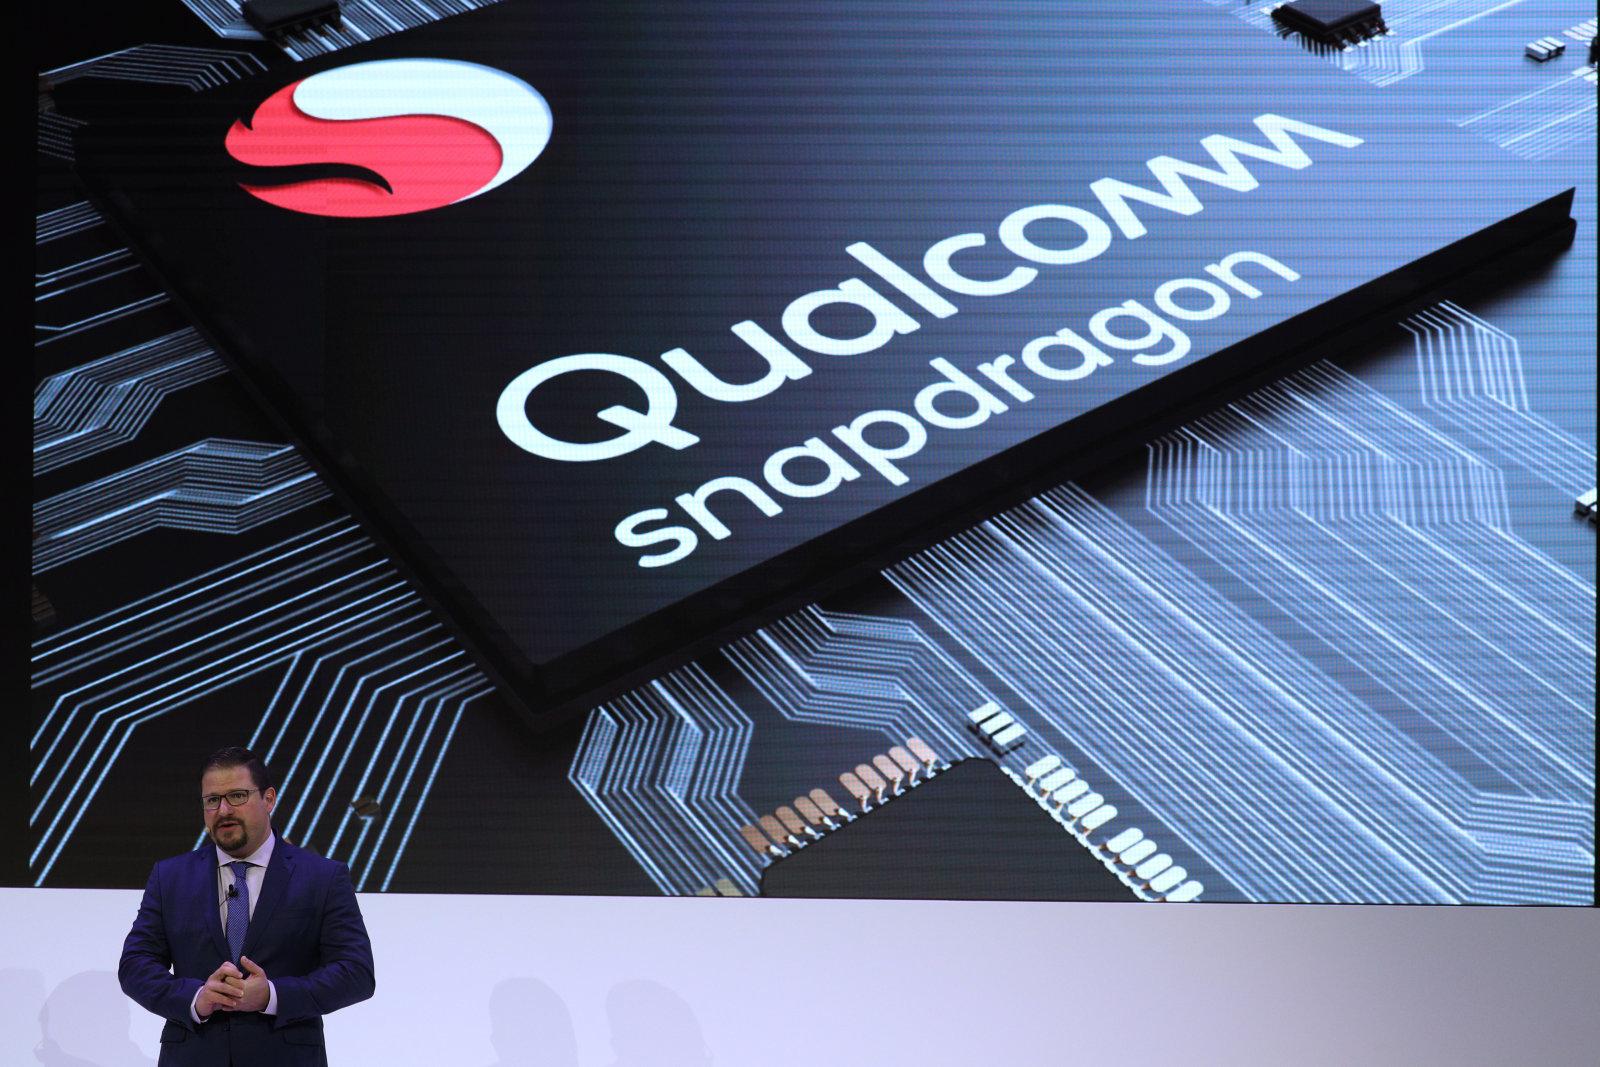 Qualcomm Snapdragon 700 был представлен на выставке MWC 2018